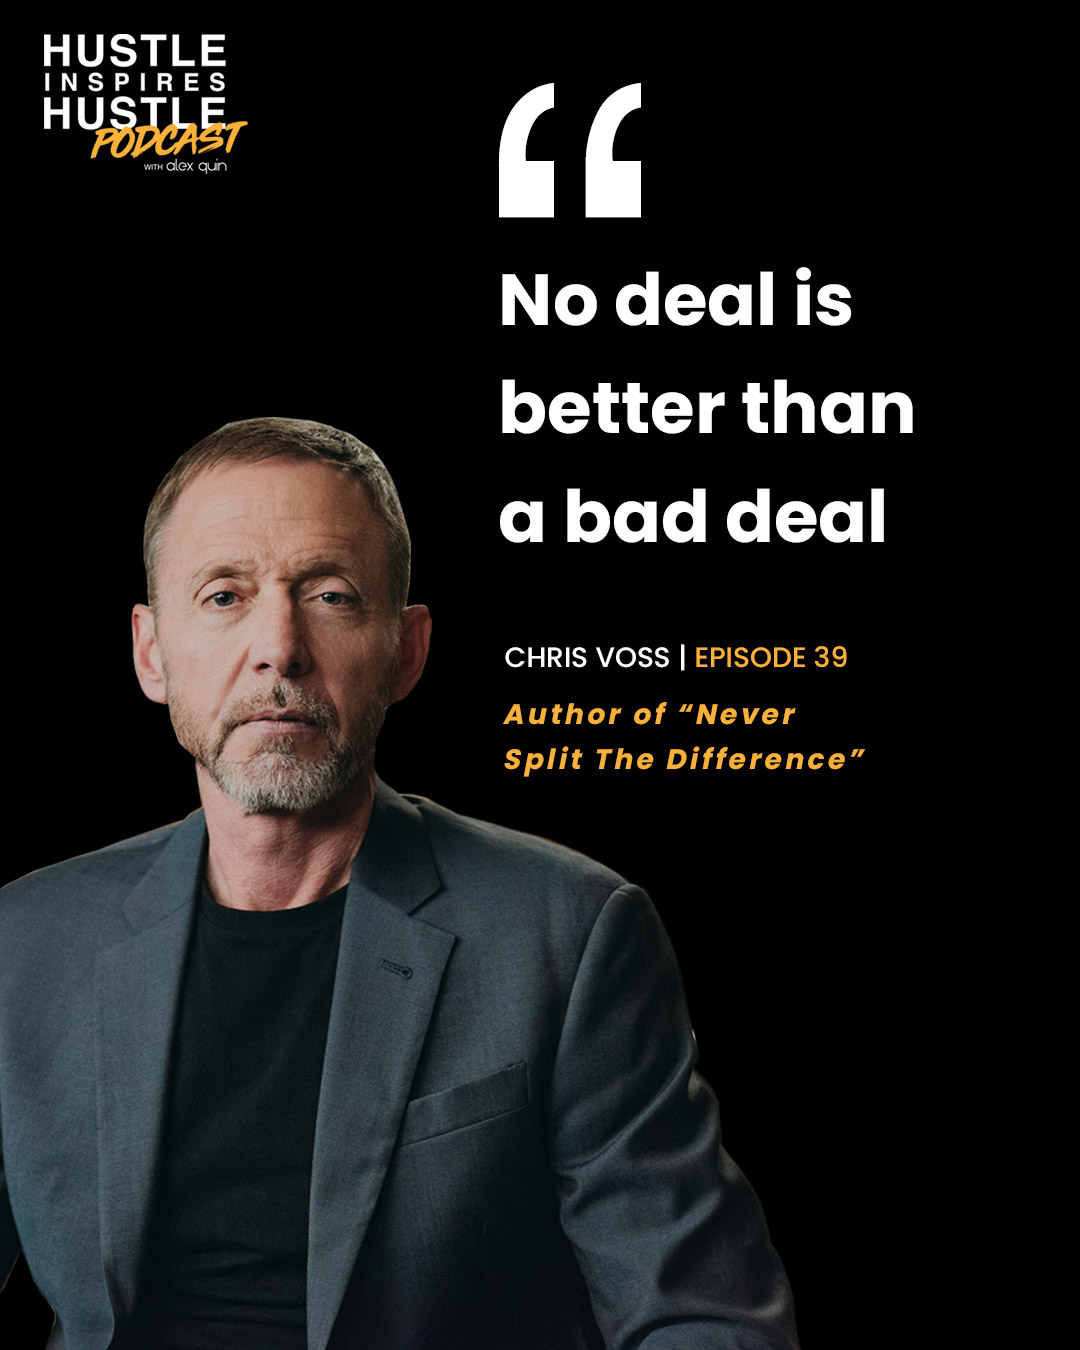 Chris Voss & Alex Quin Hustle Inspires Hustle Podcast